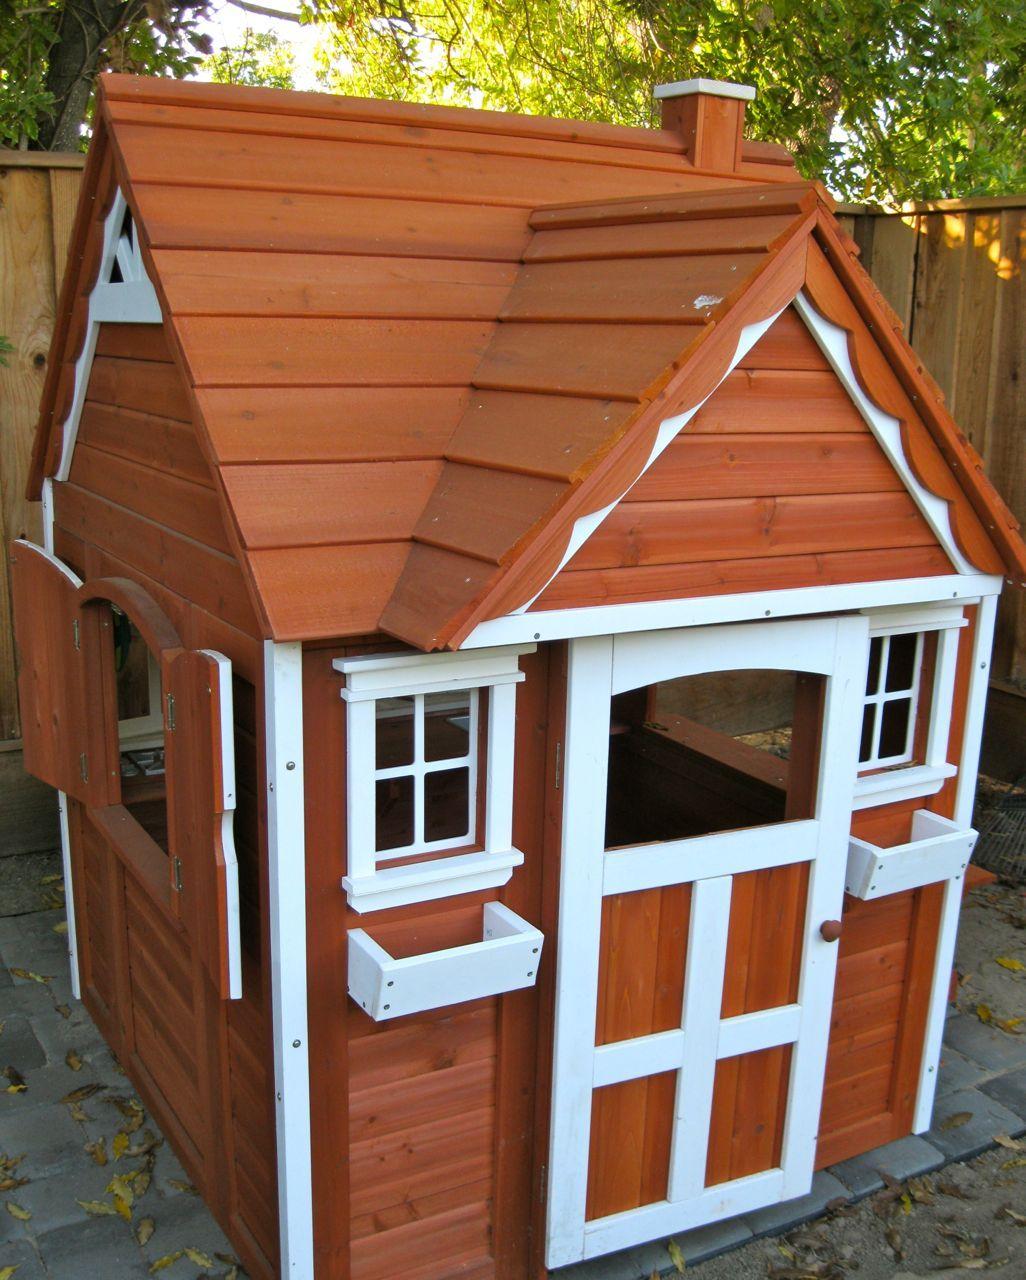 cedar playhouse from costco nursery ideas pinterest cedar